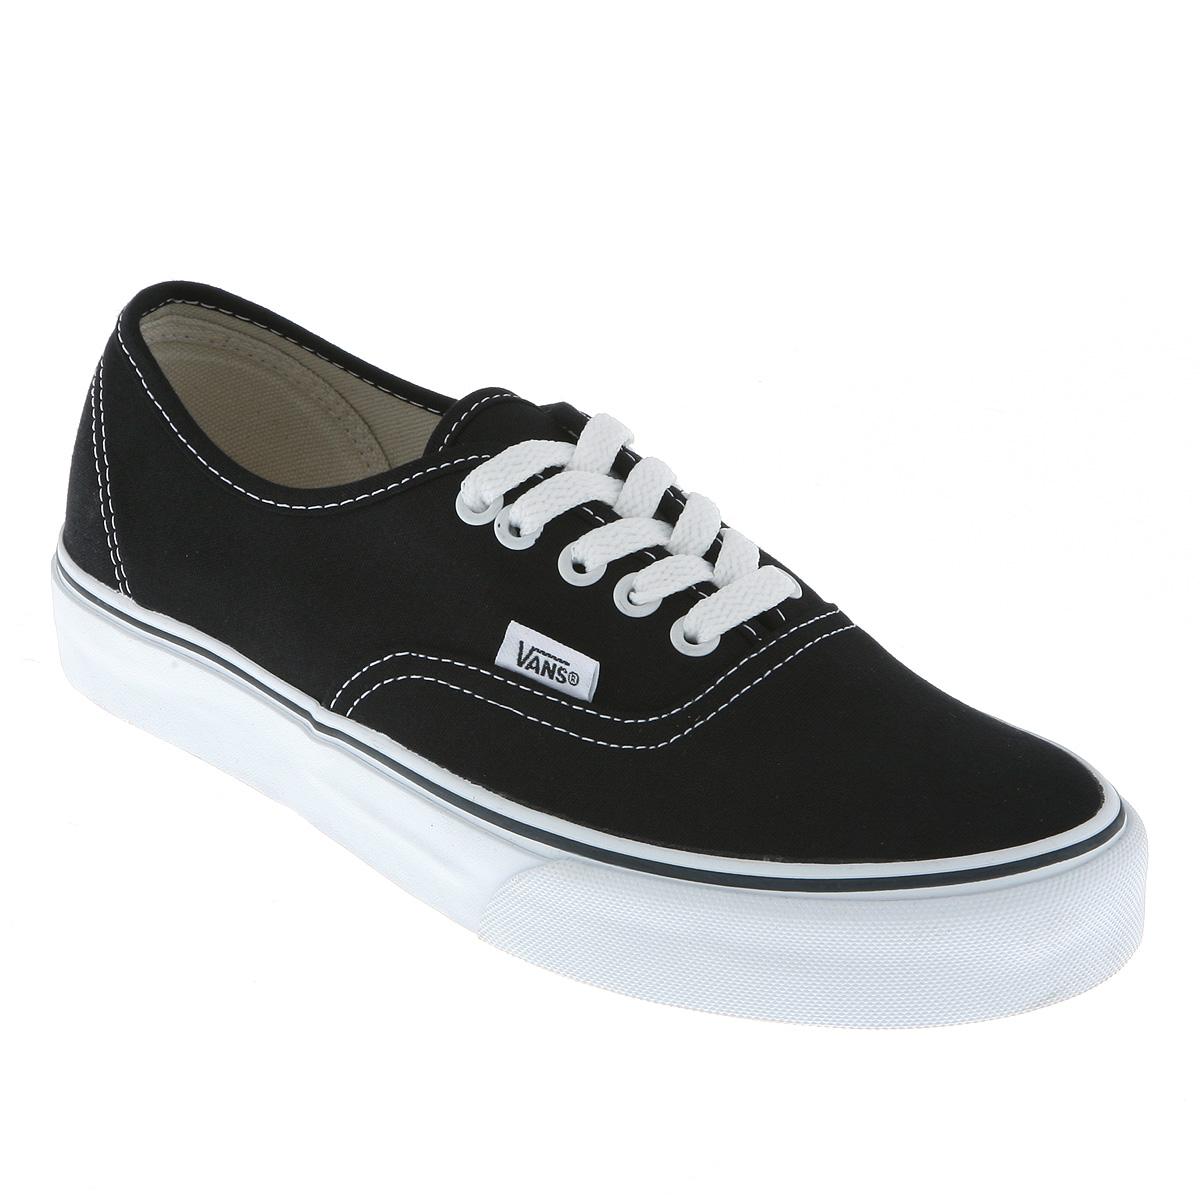 Black And White Vans For Girls Led vans shoes related keywords ...